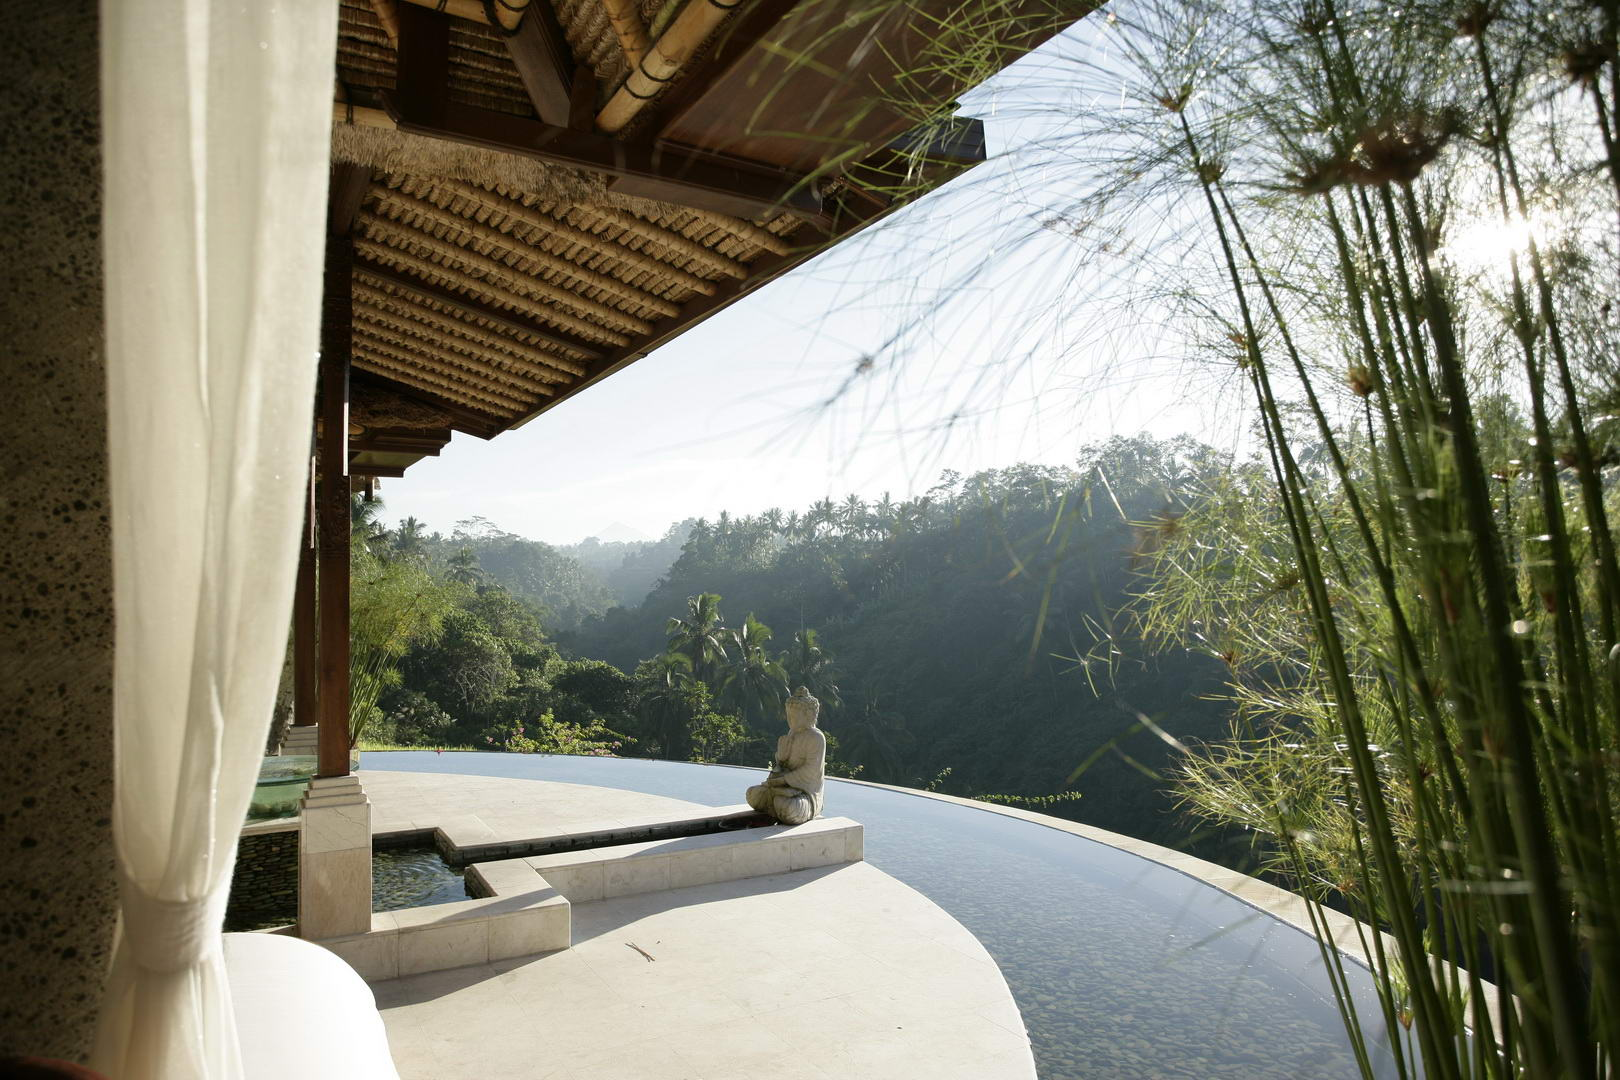 Eriks Bali 197